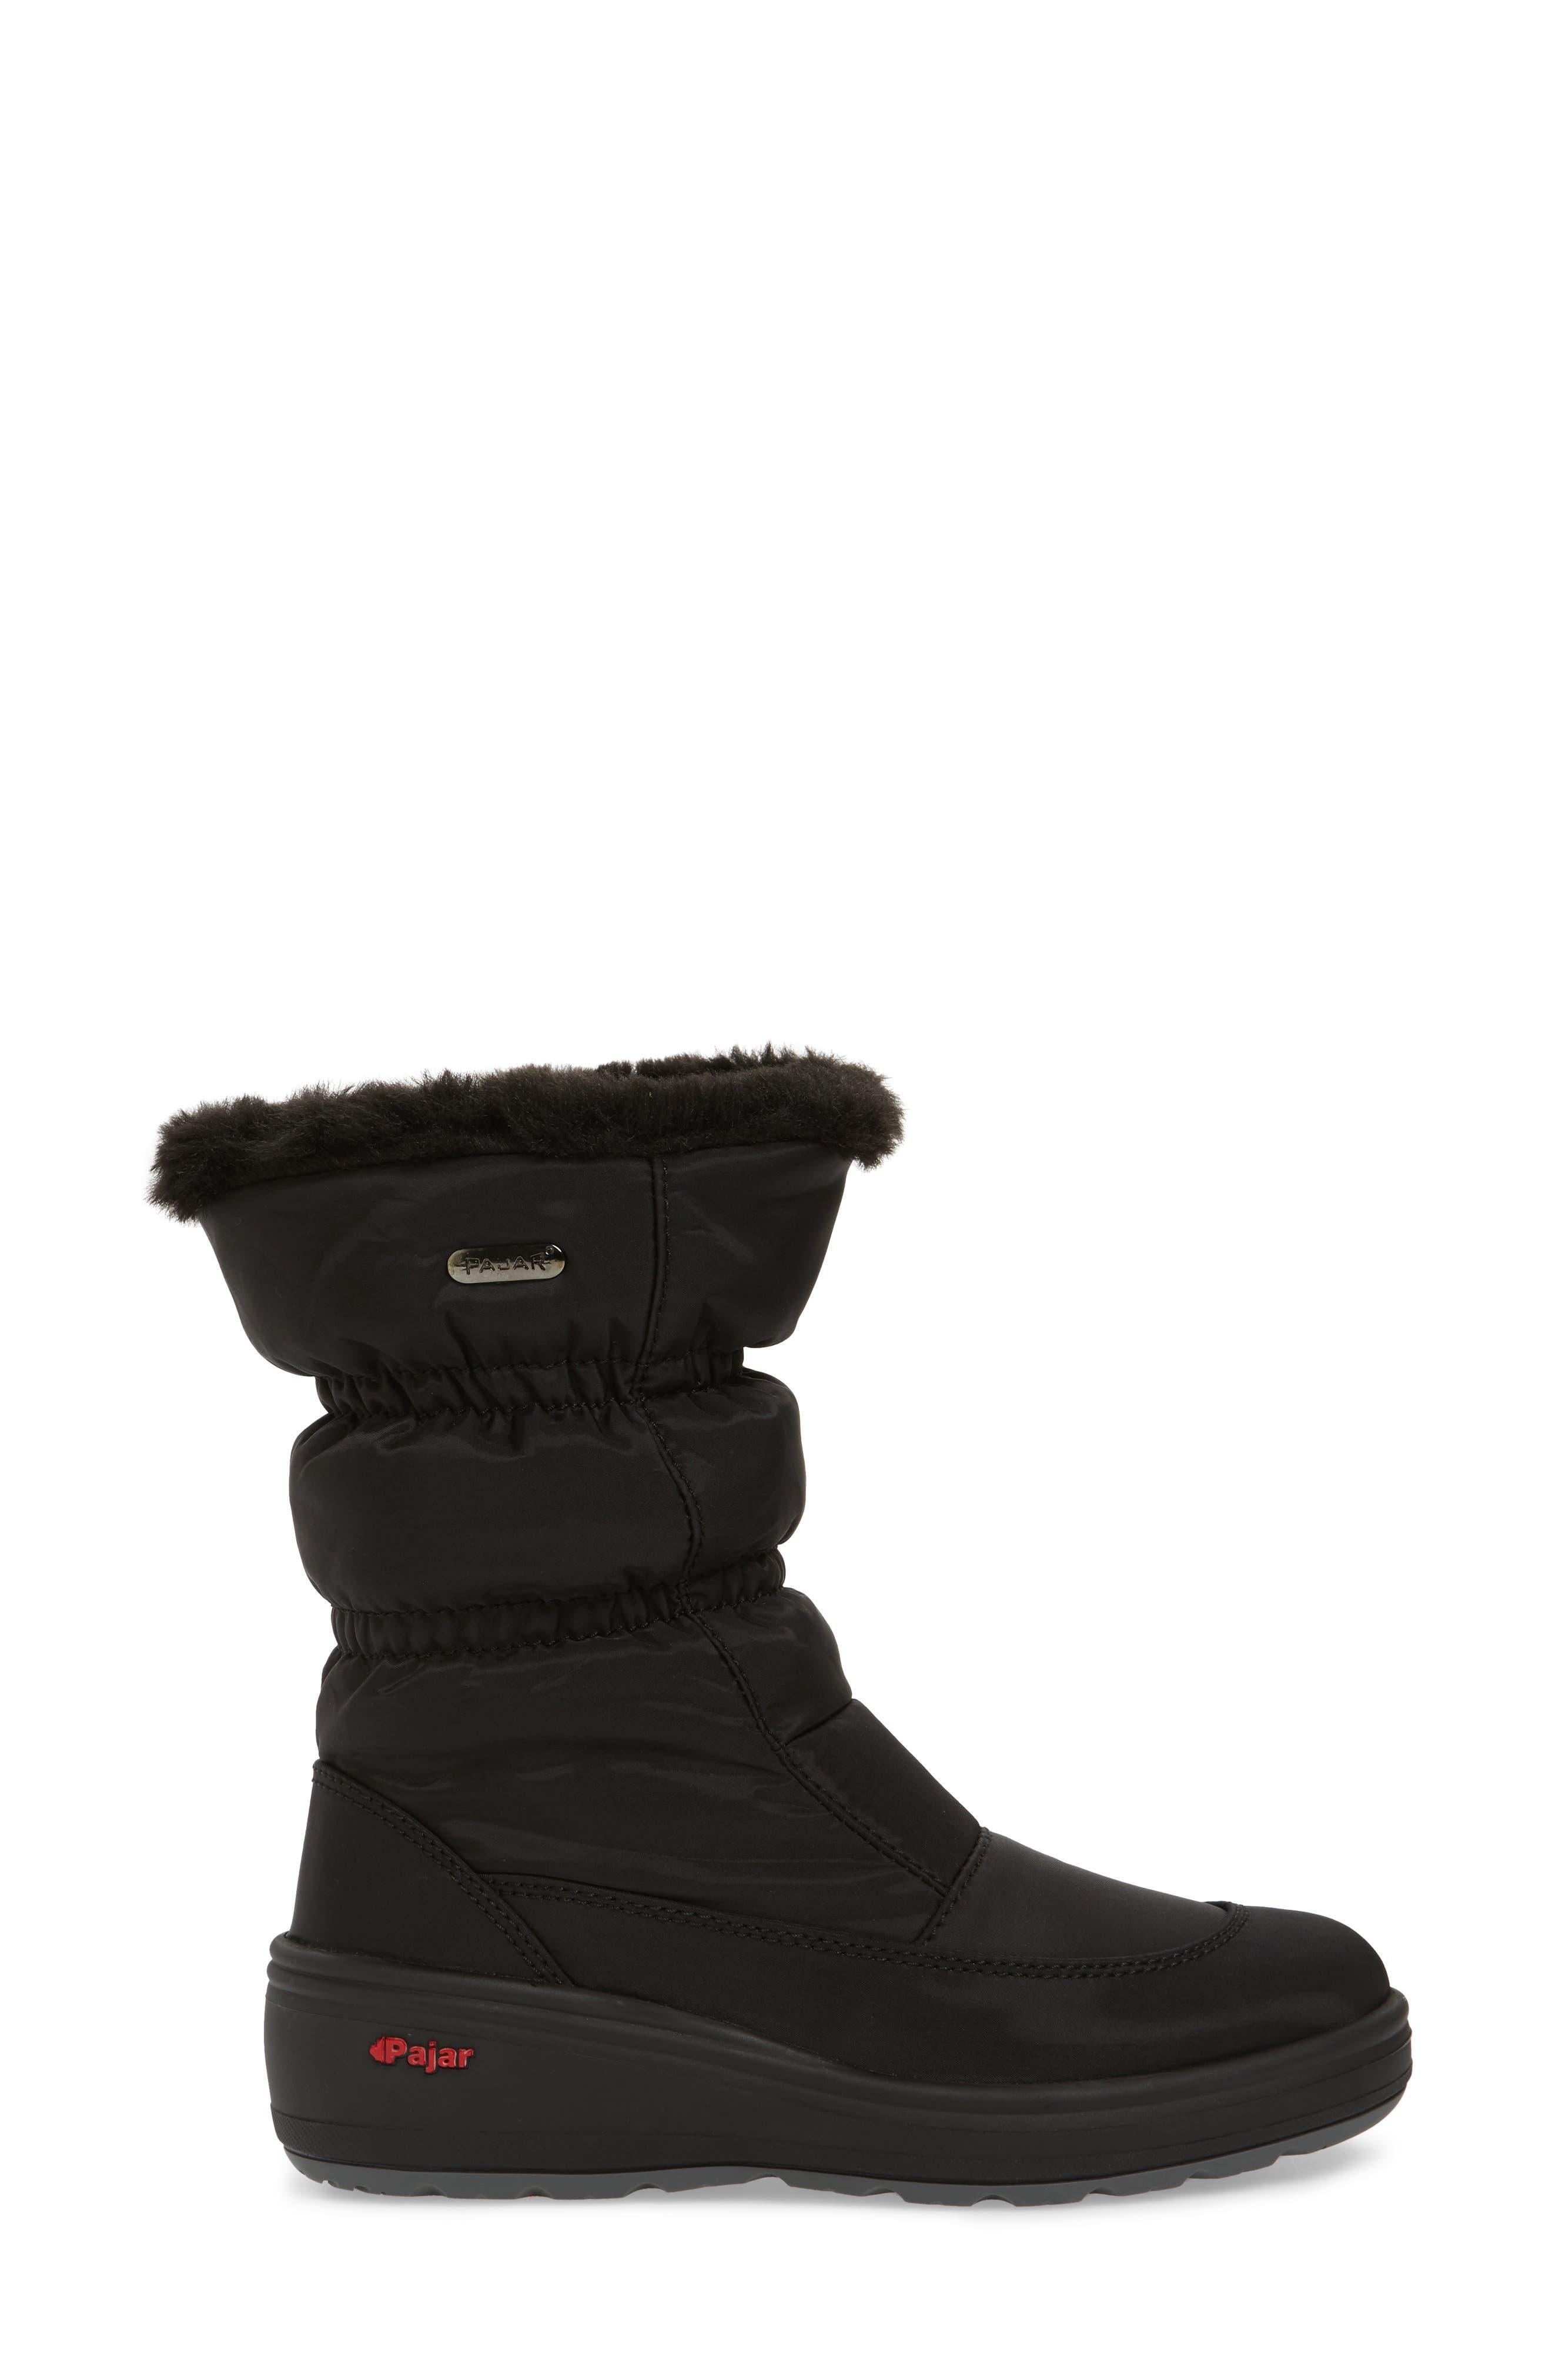 Snowcap Waterproof Insulated Winter Boot,                             Alternate thumbnail 3, color,                             BLACK FABRIC